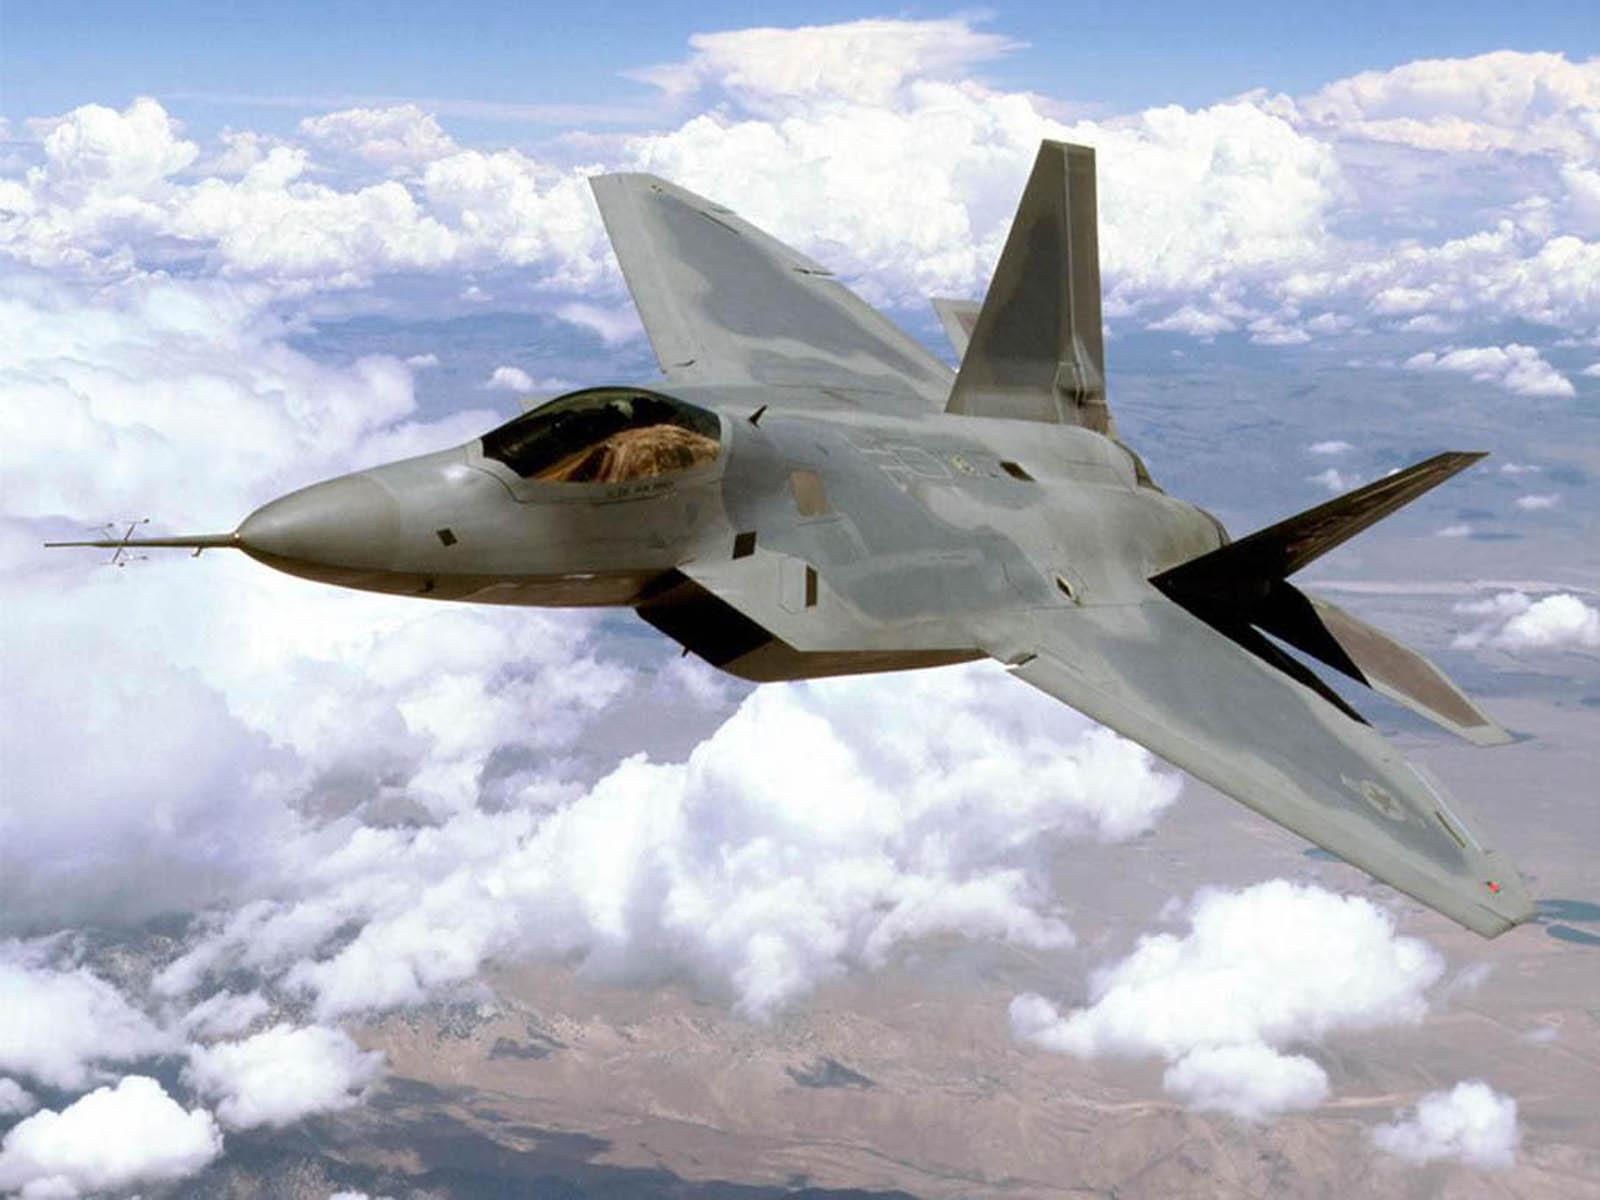 22 Raptor Military Jet Fighter Wallpaperswallpapers screensavers 1600x1200